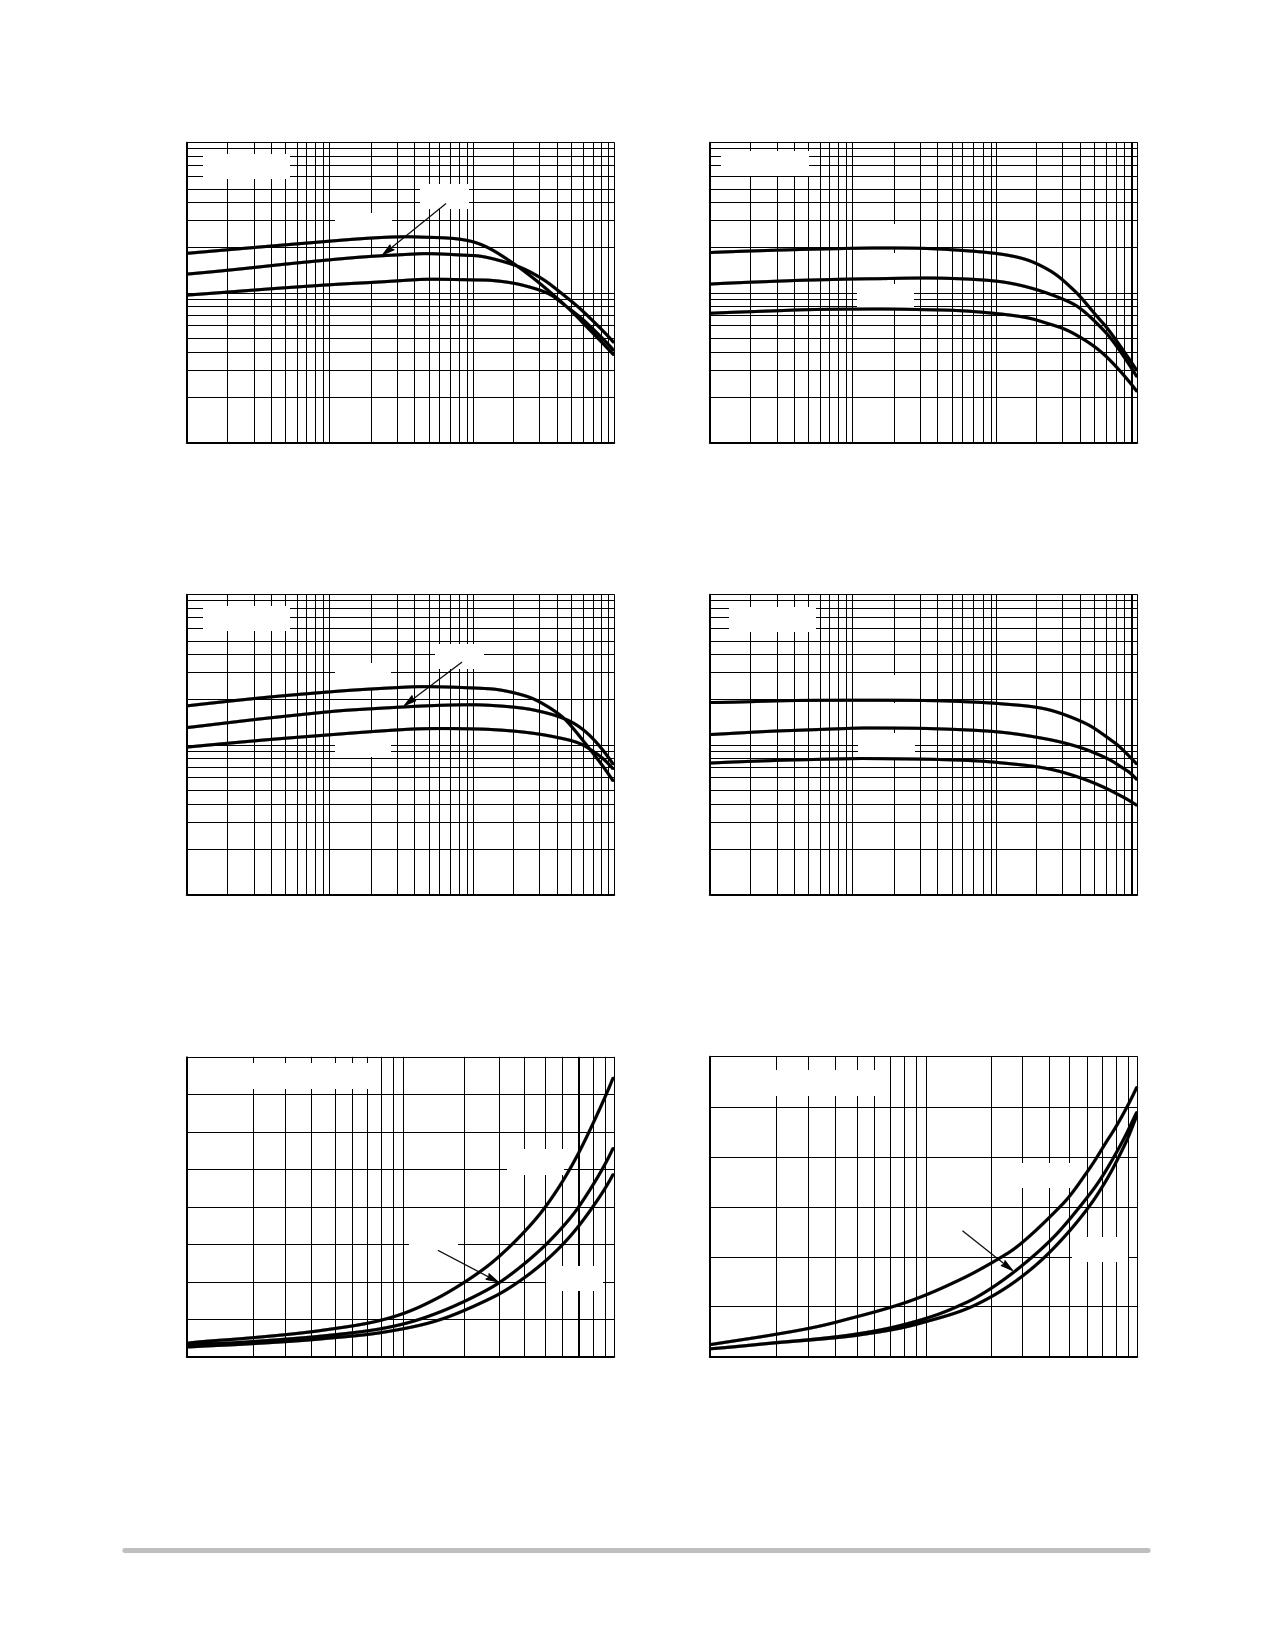 D45H10 pdf, ピン配列